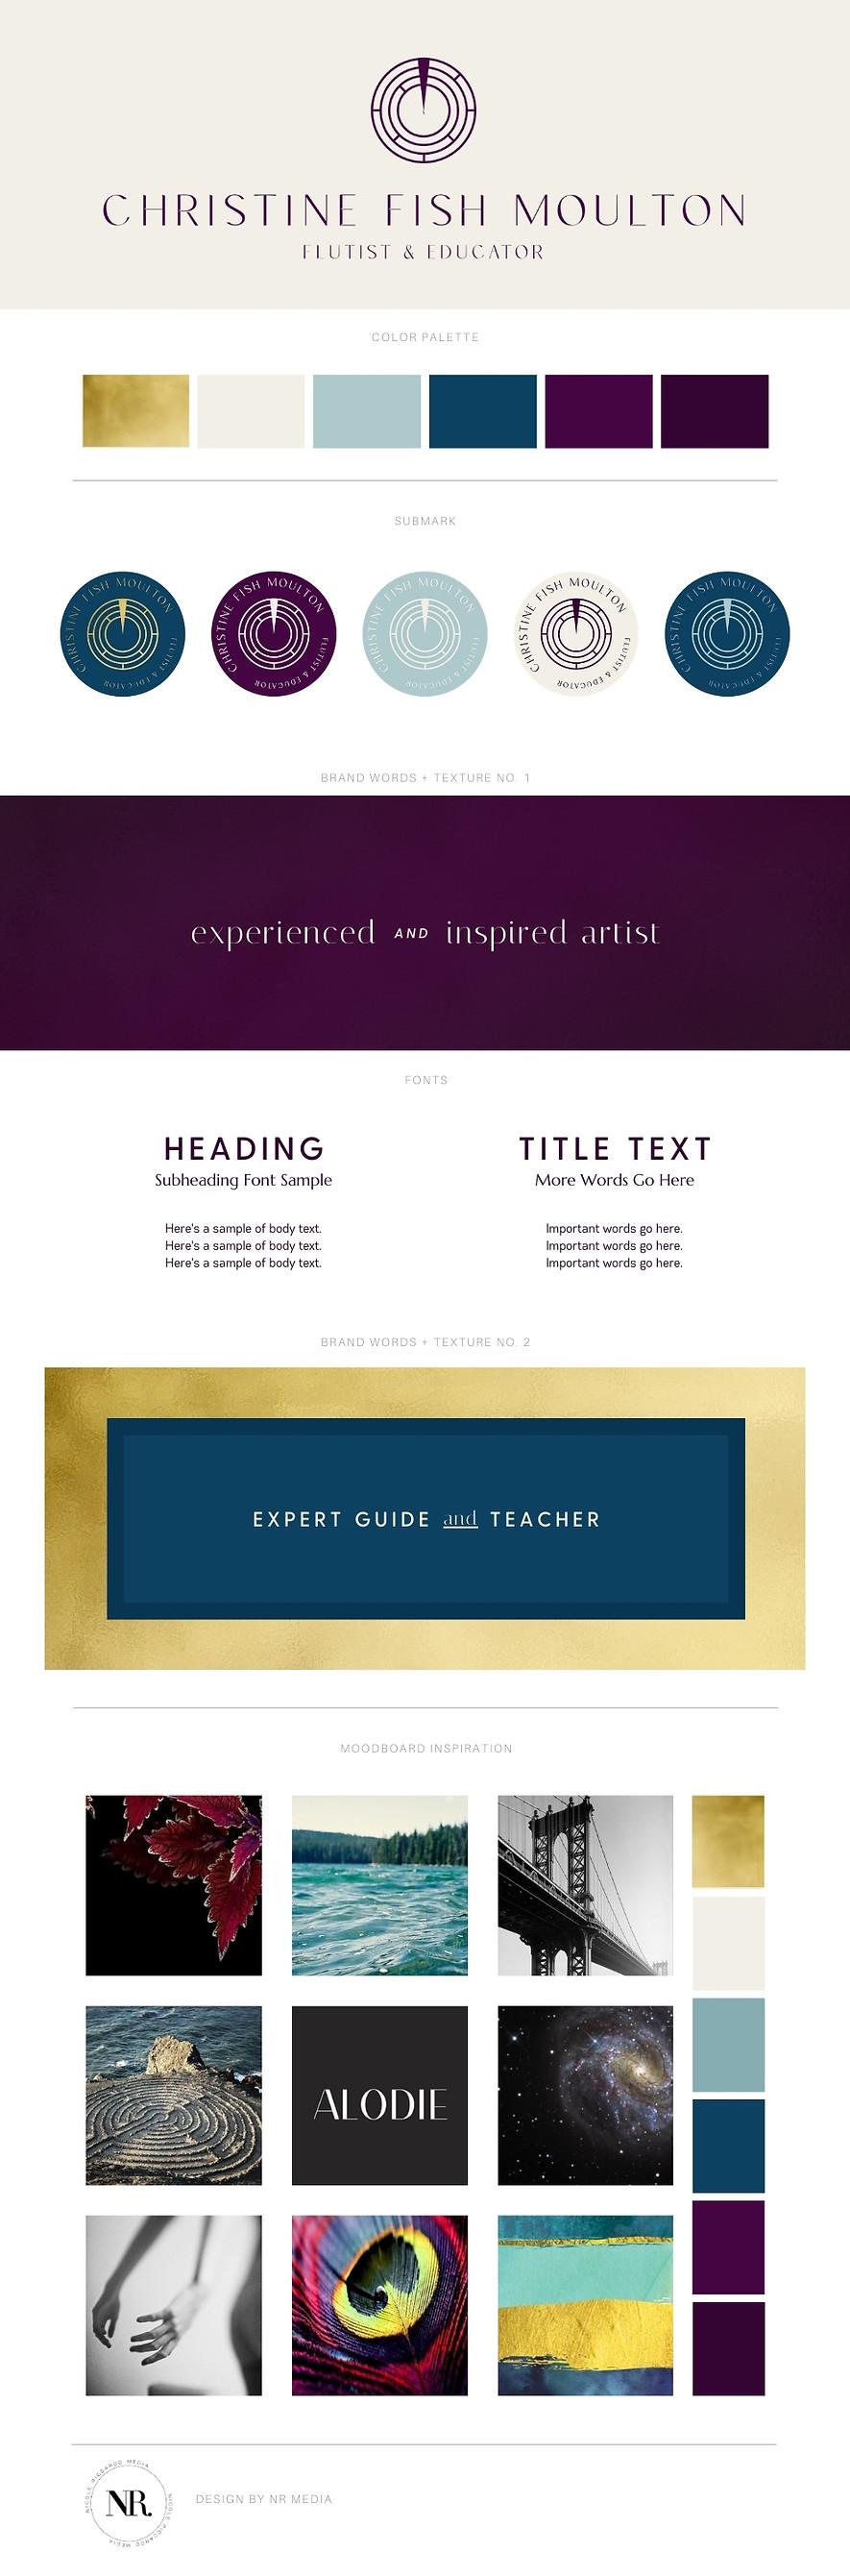 Christine Moulton Brand Board (2).jpg